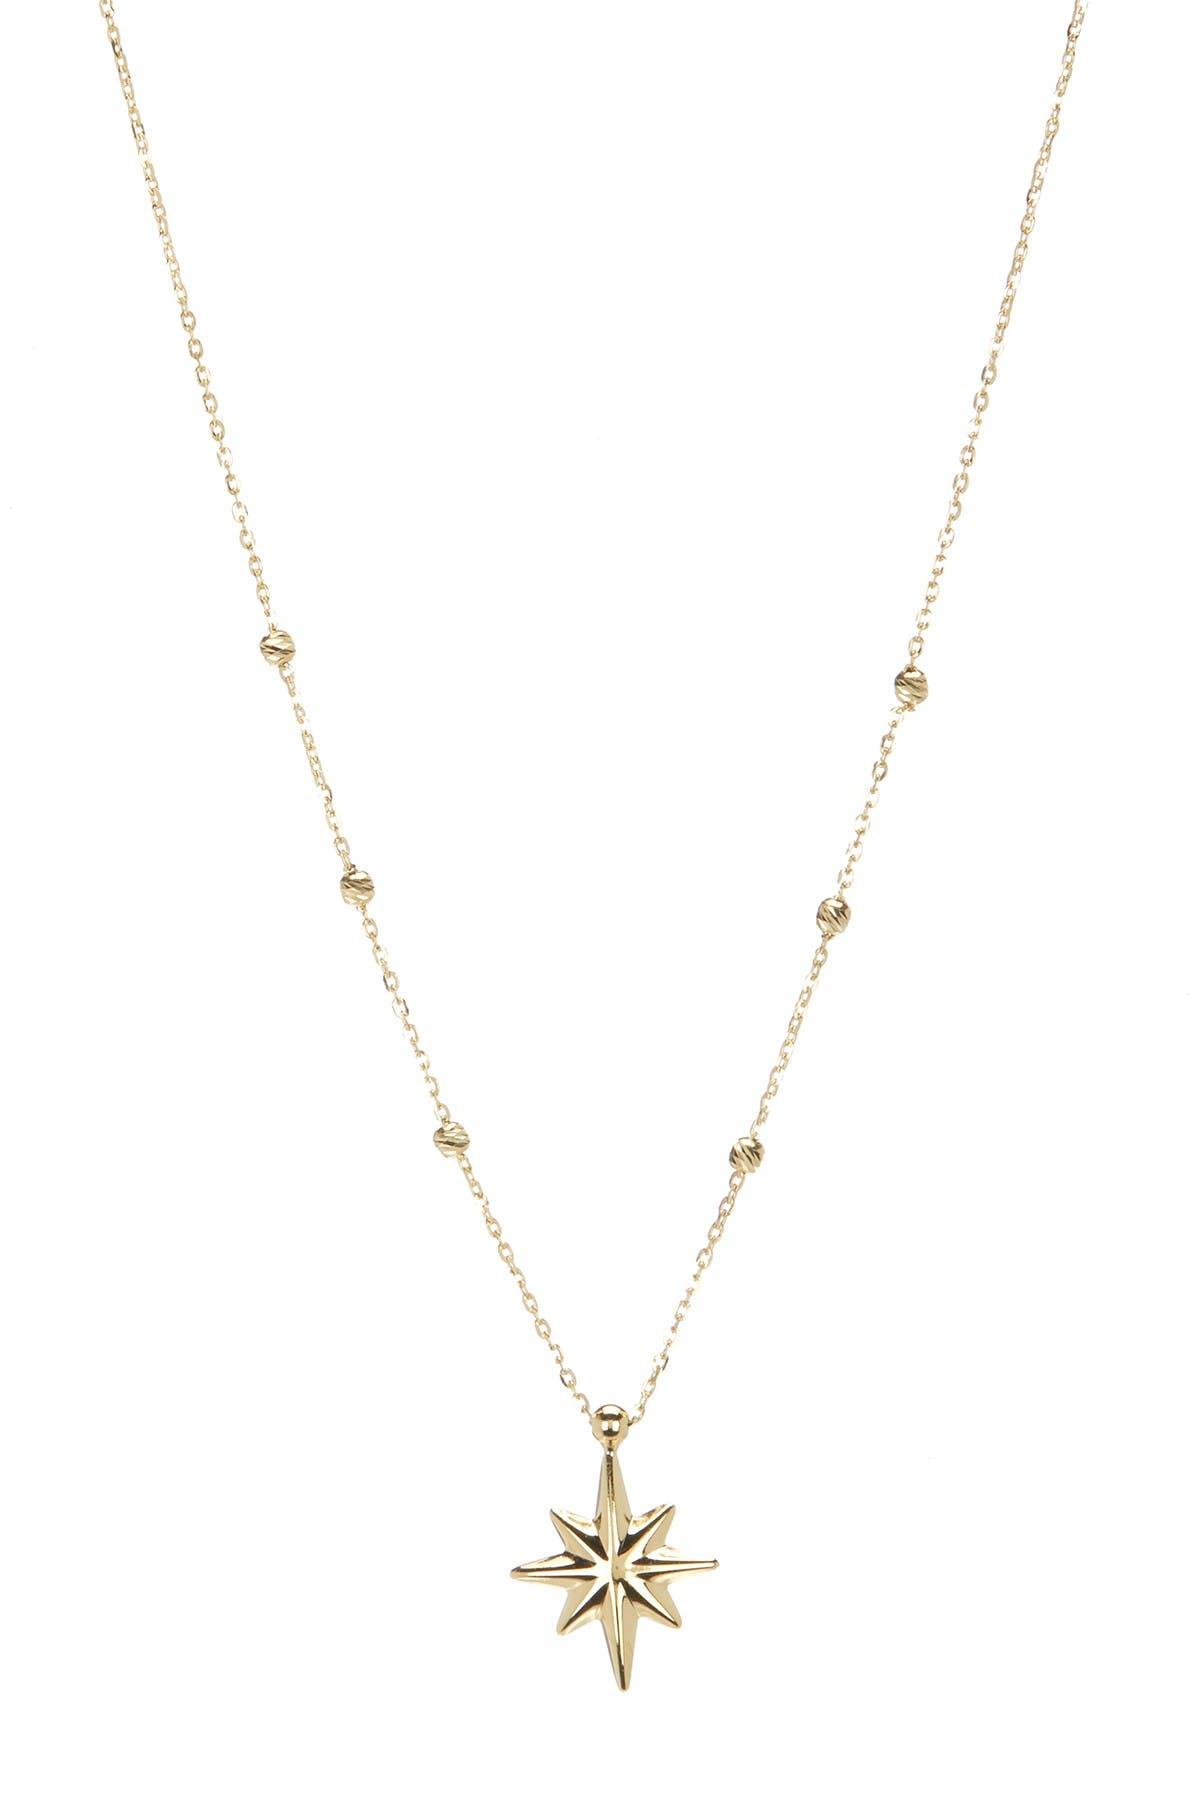 Image of KARAT RUSH 14K Yellow Gold Star Pendant Necklace